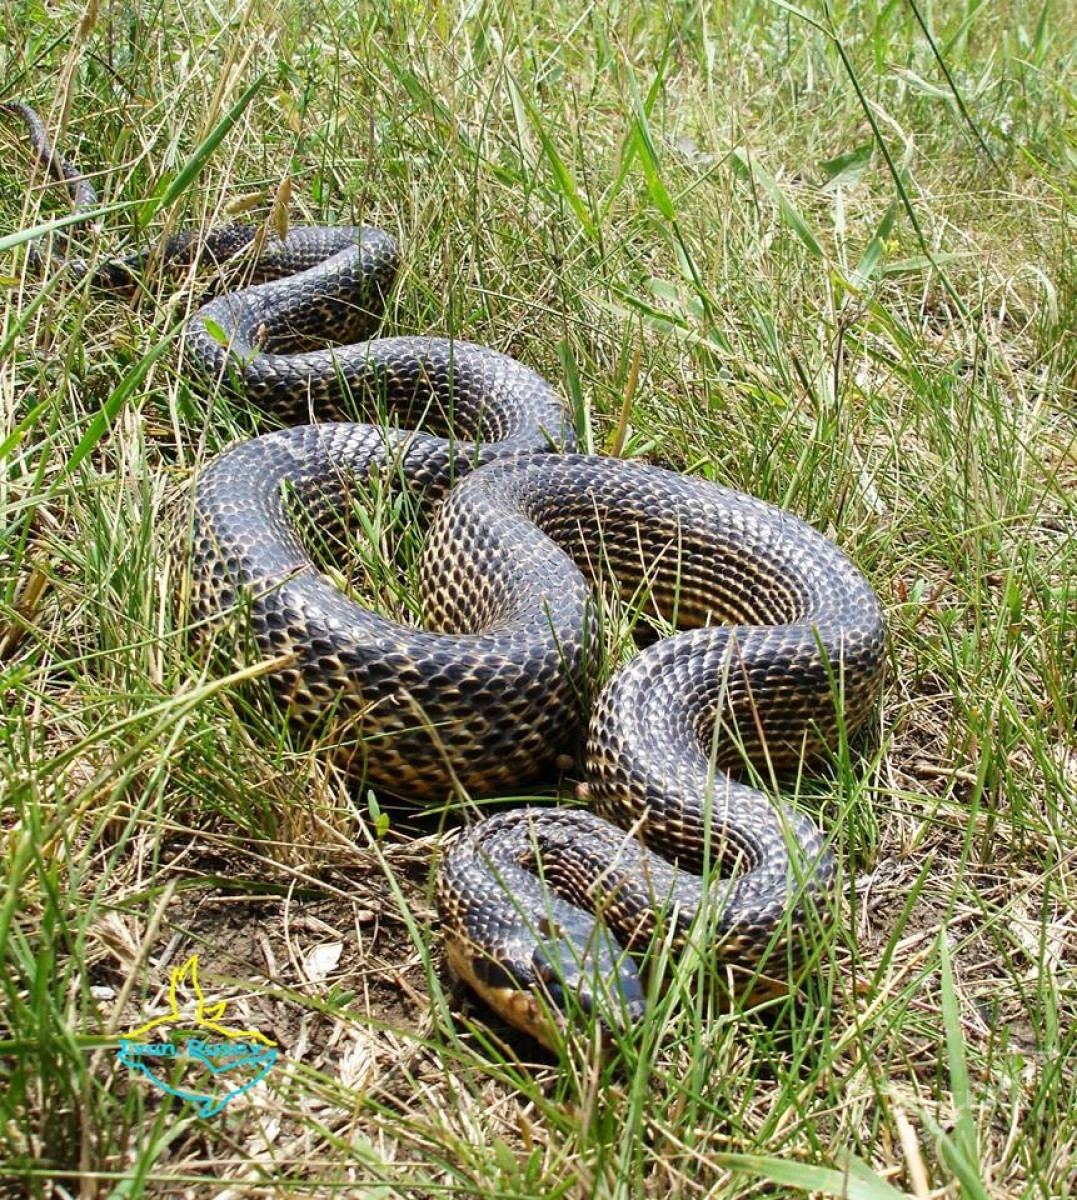 6add891532f8602c2e3f59b1760267be В Одесской области обнаружили редкий вид змей